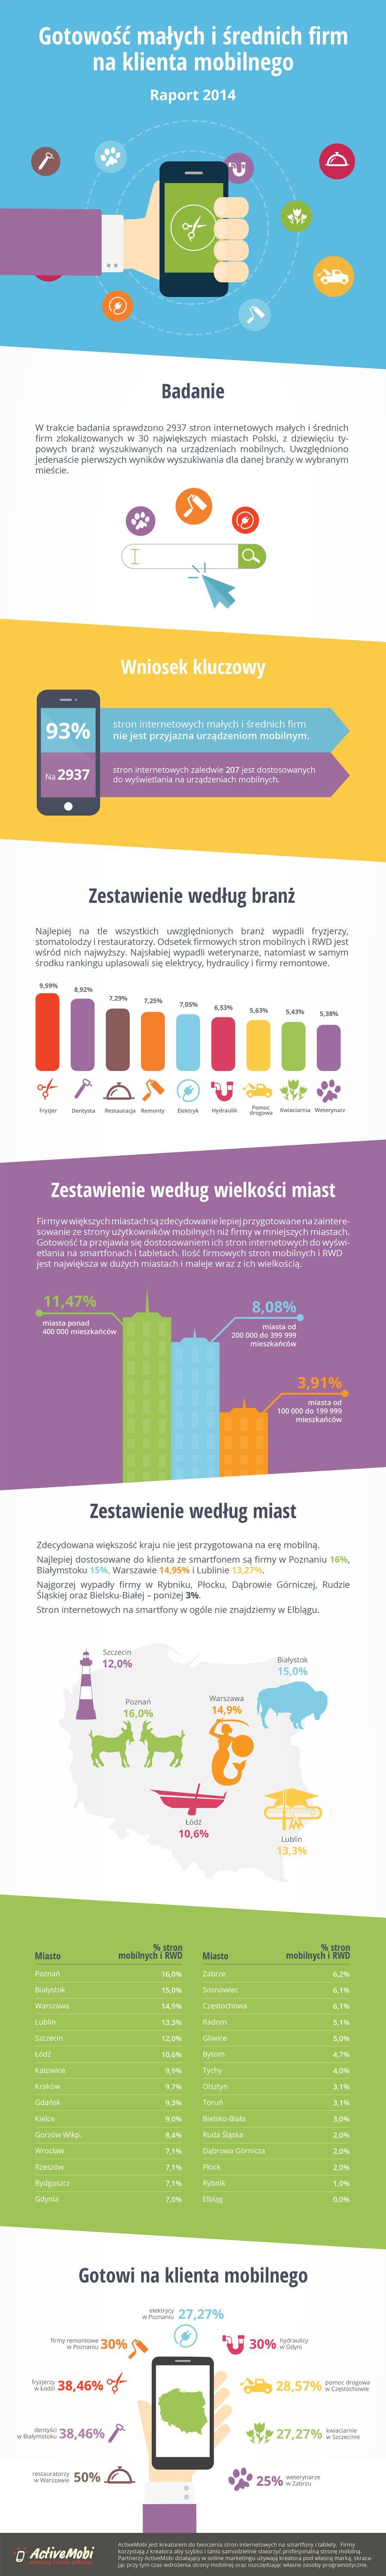 infografika-gotowosc-sektora-msp-na-klienta-mobilnego-activemobi